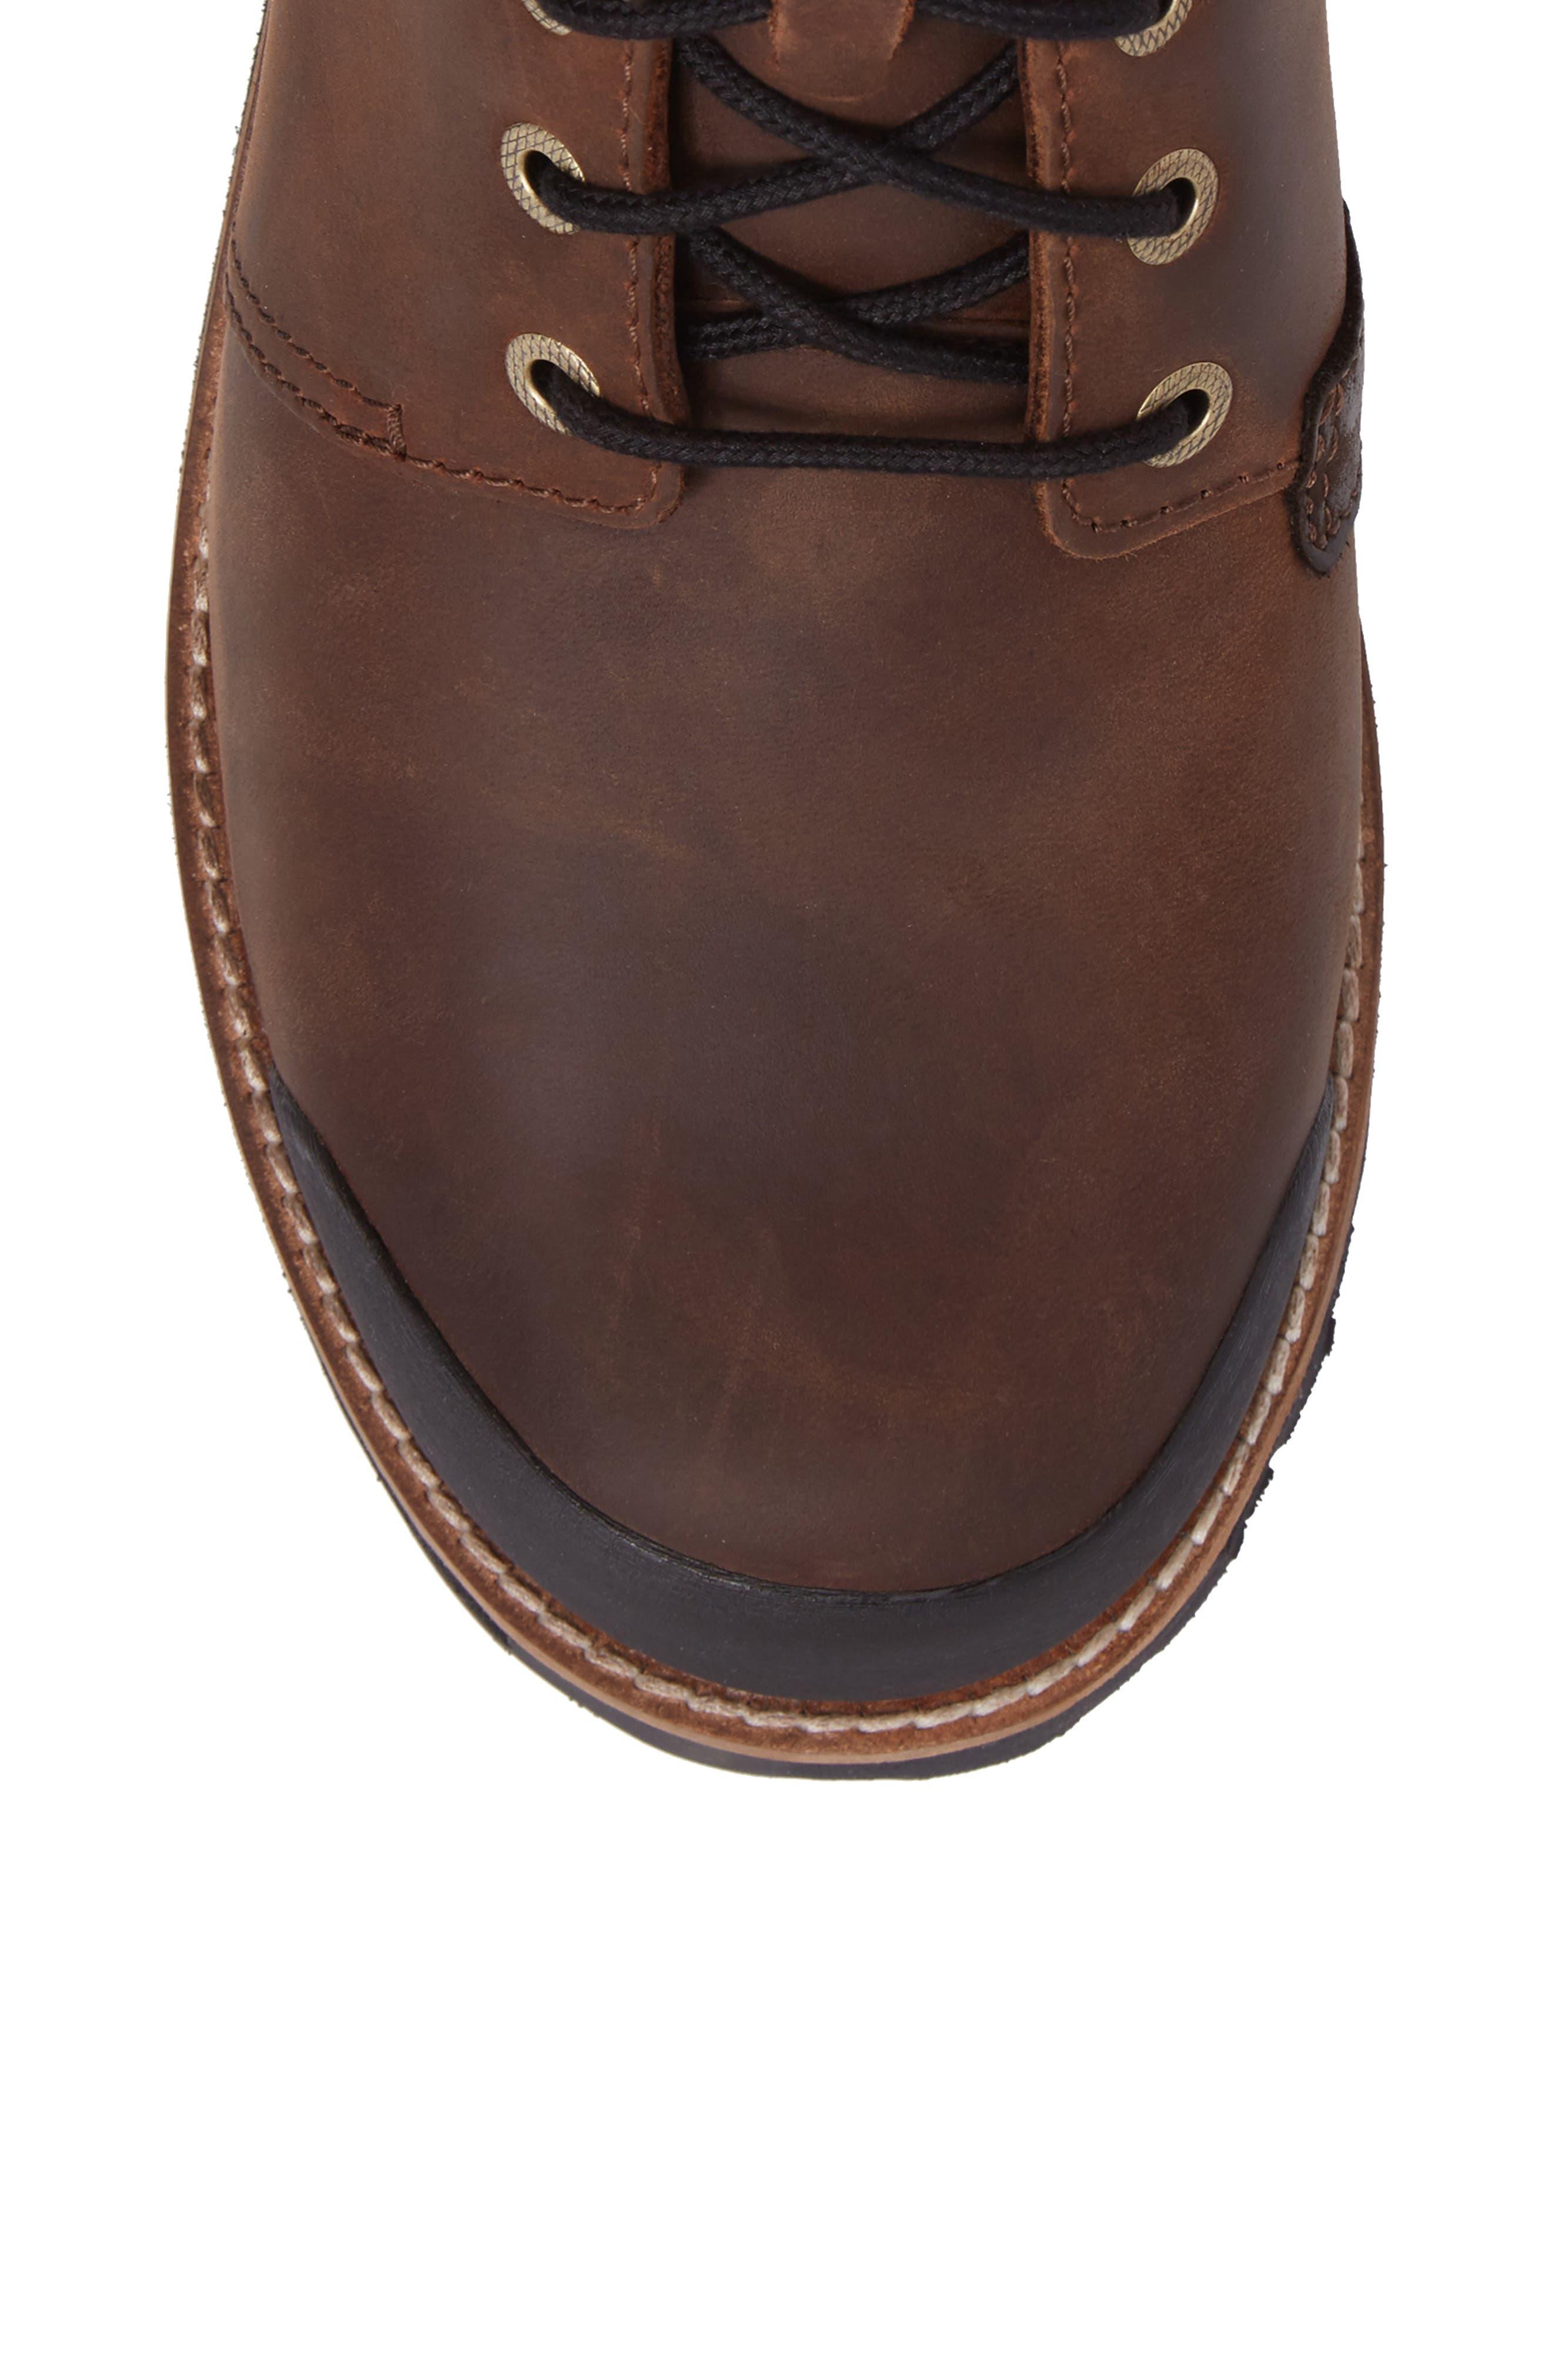 KEEN, The Rocker Waterproof Plain Toe Boot, Alternate thumbnail 5, color, BIG BEN/ EIFFEL